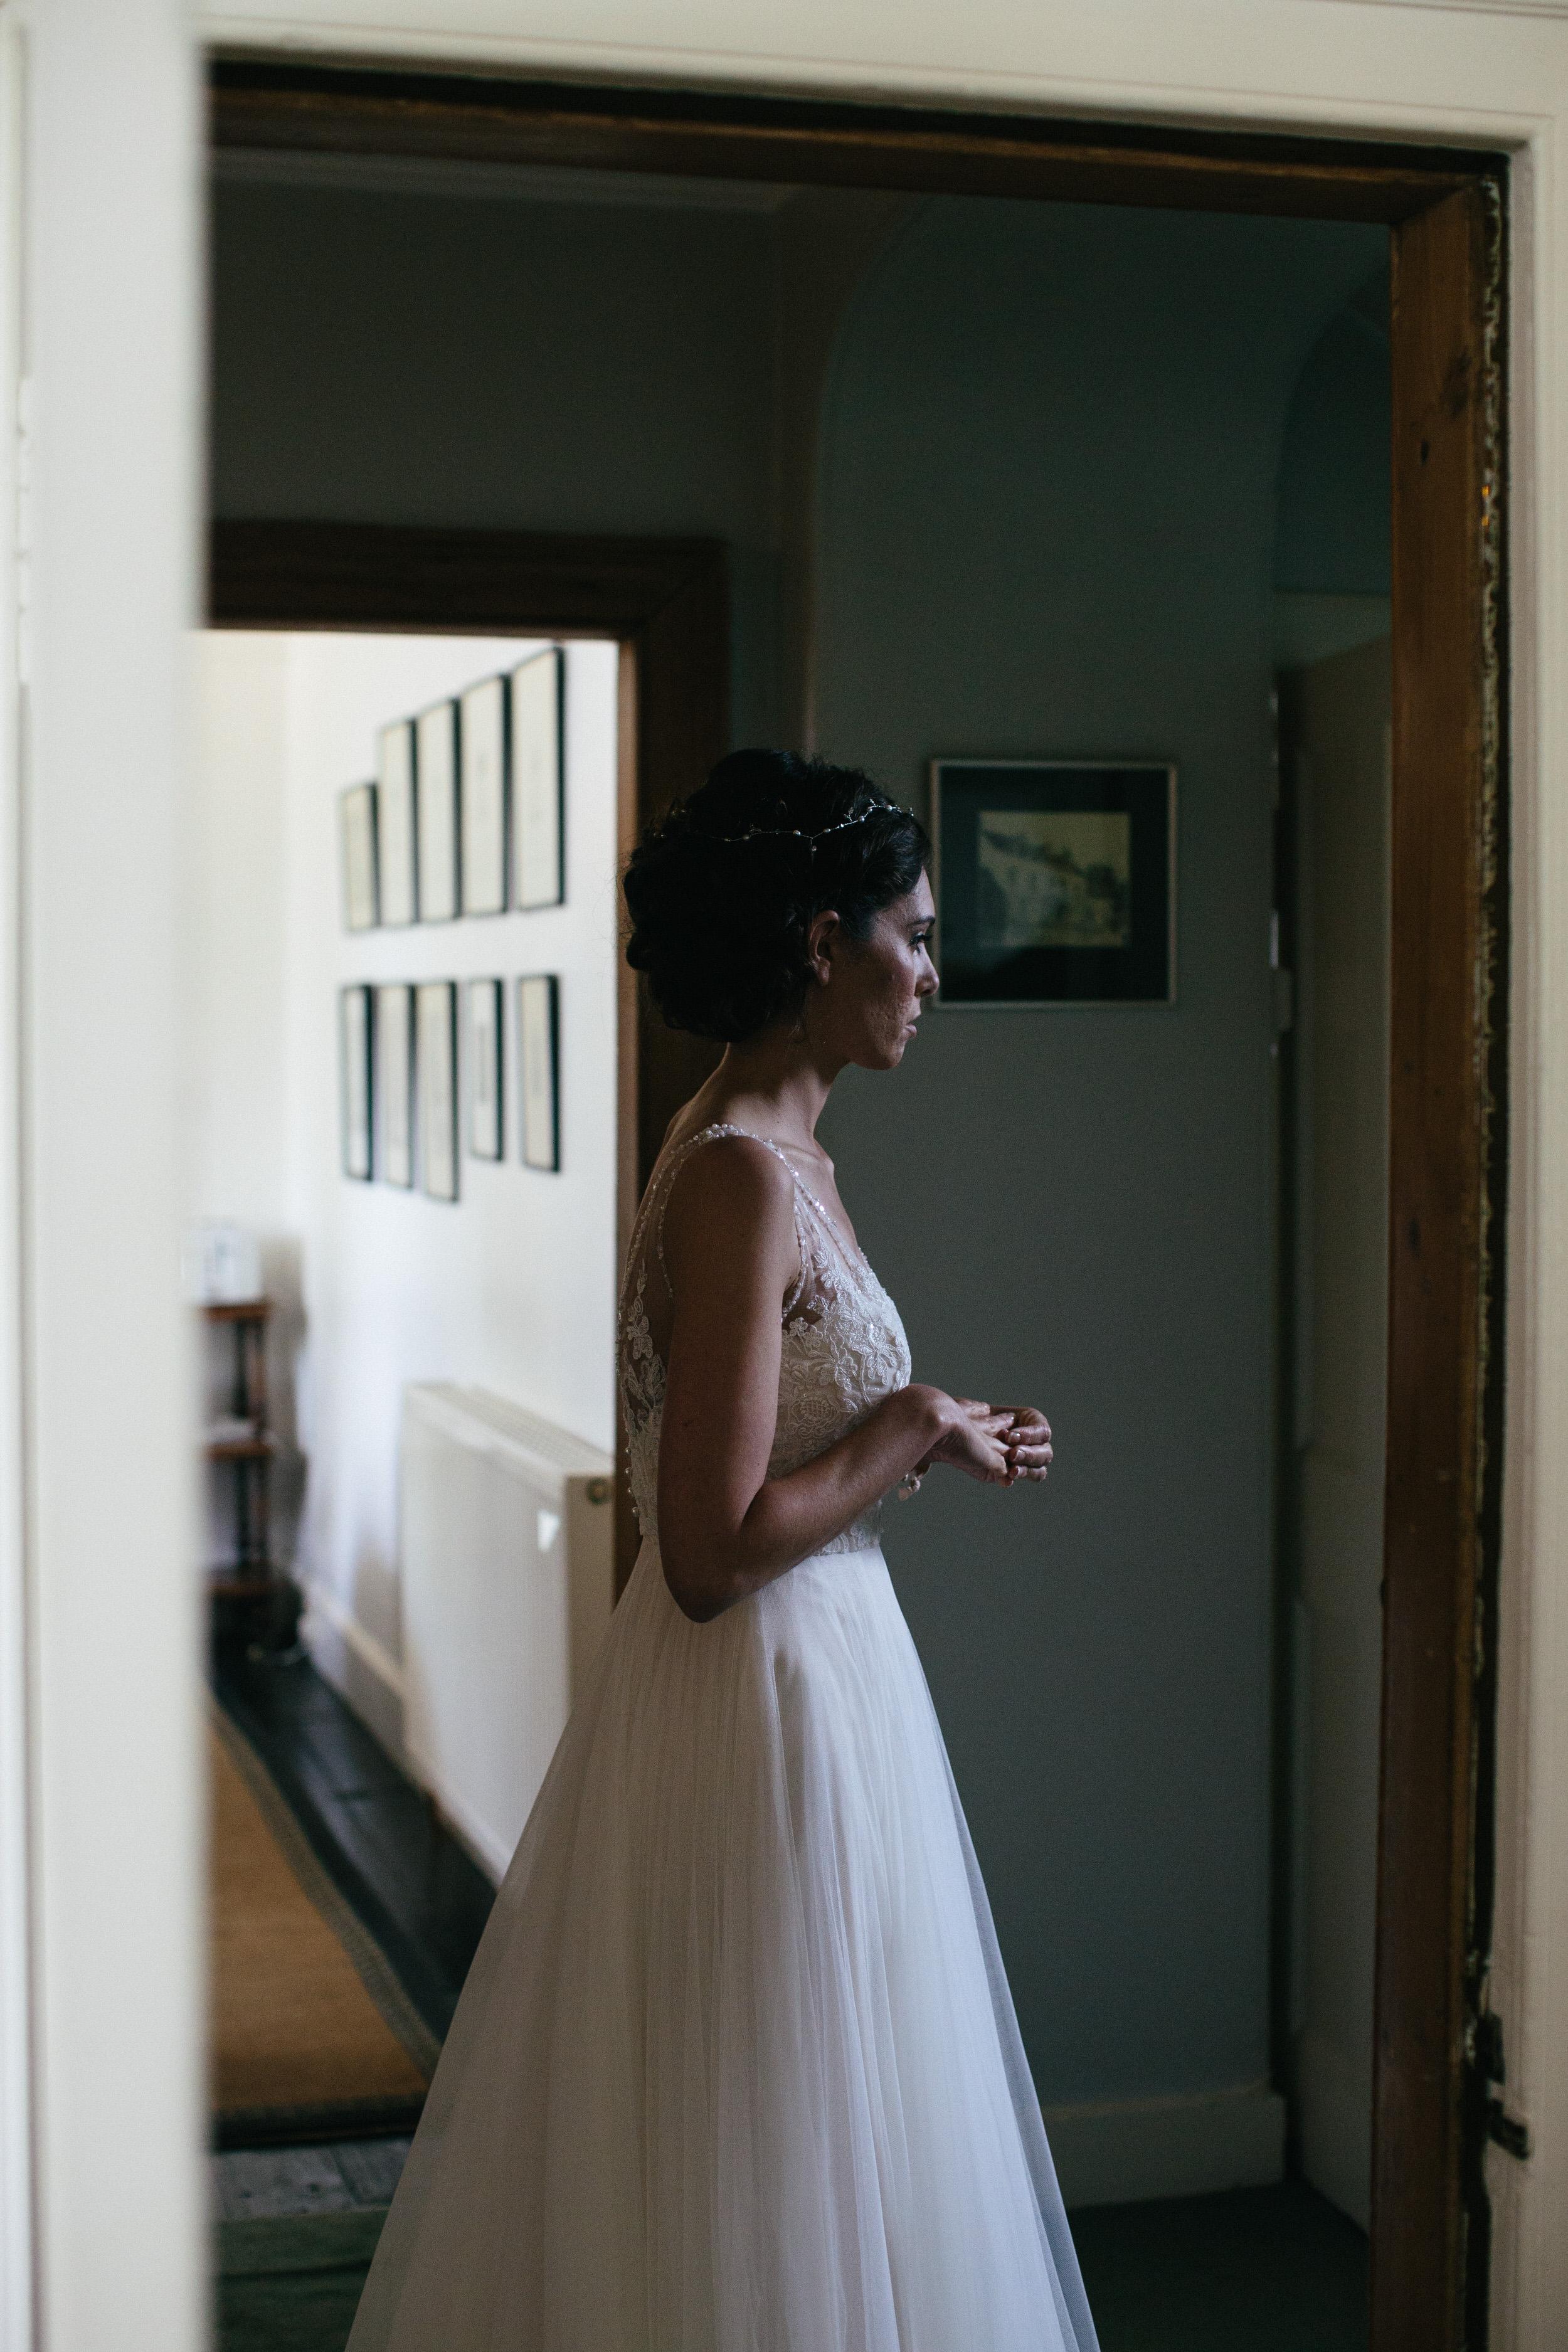 Quirky Wedding Photographer Scotland Glasgow Edinburgh Mirrorbox 055.jpg